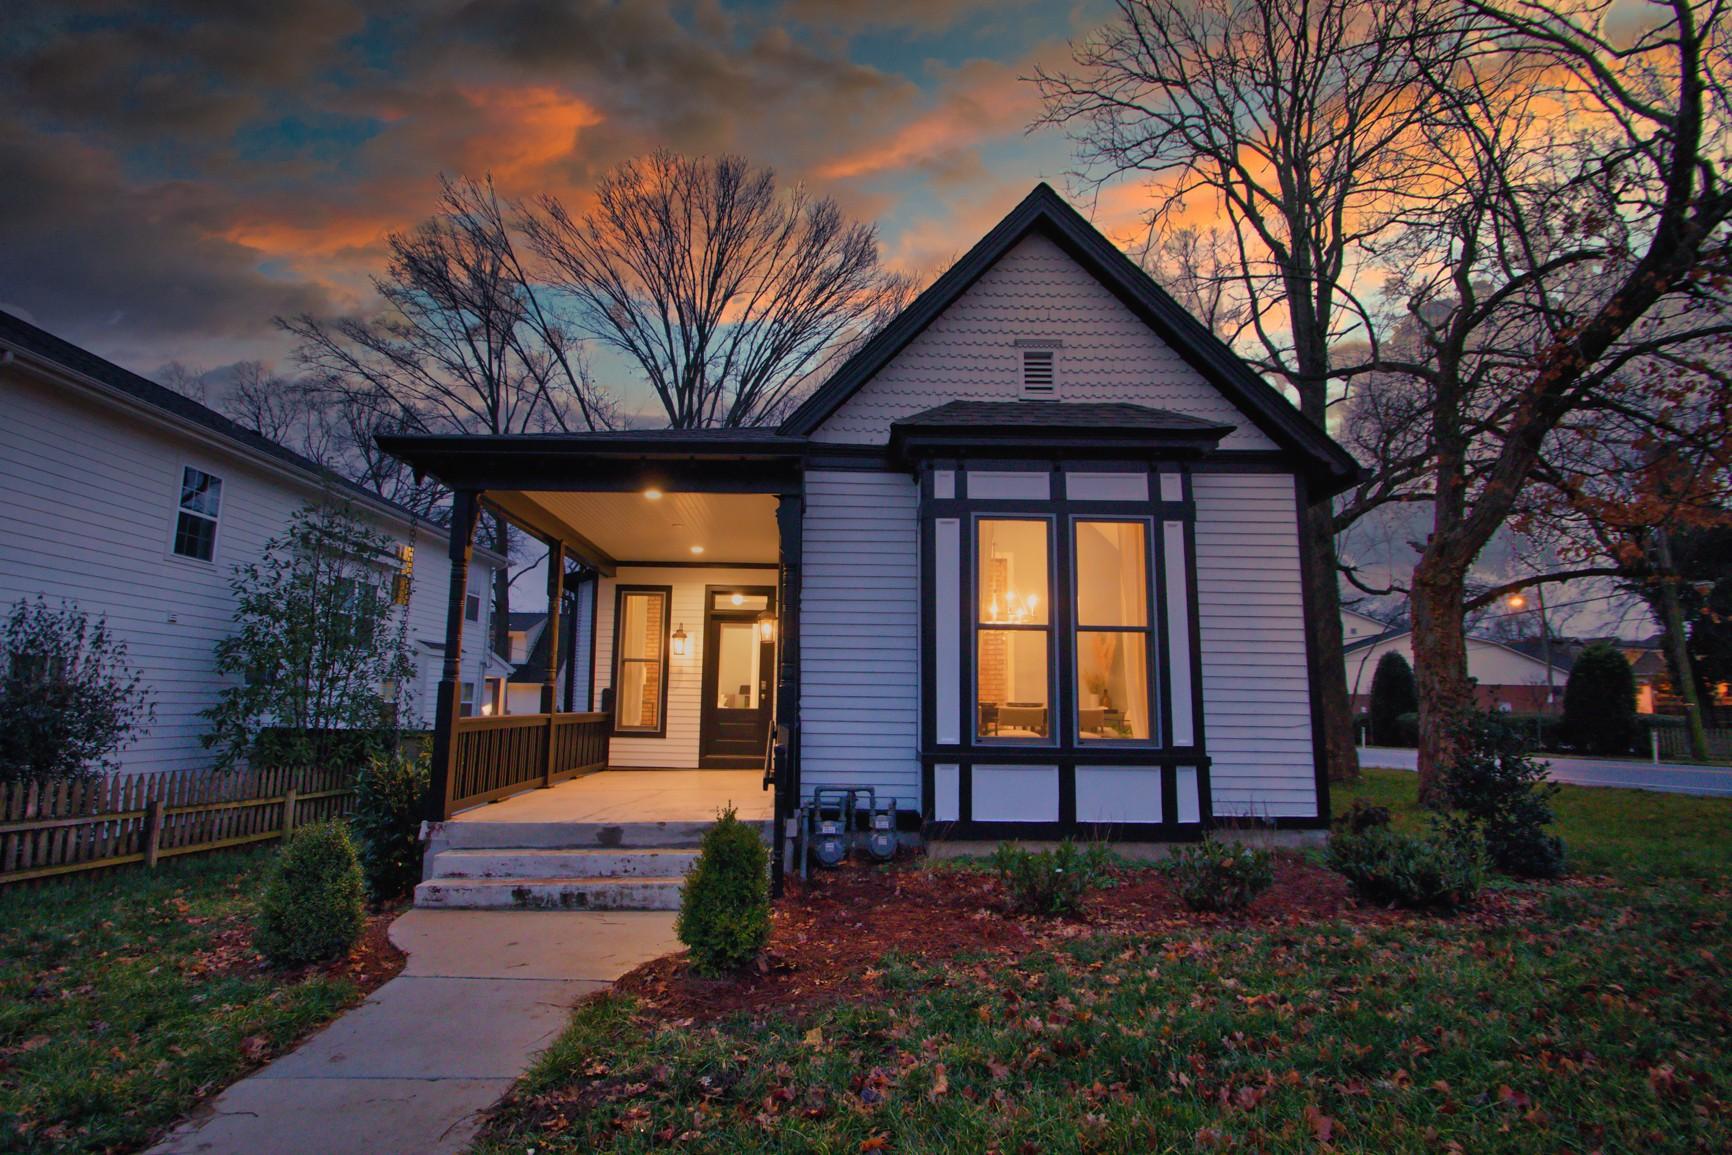 929 Montrose Ave Property Photo - Nashville, TN real estate listing